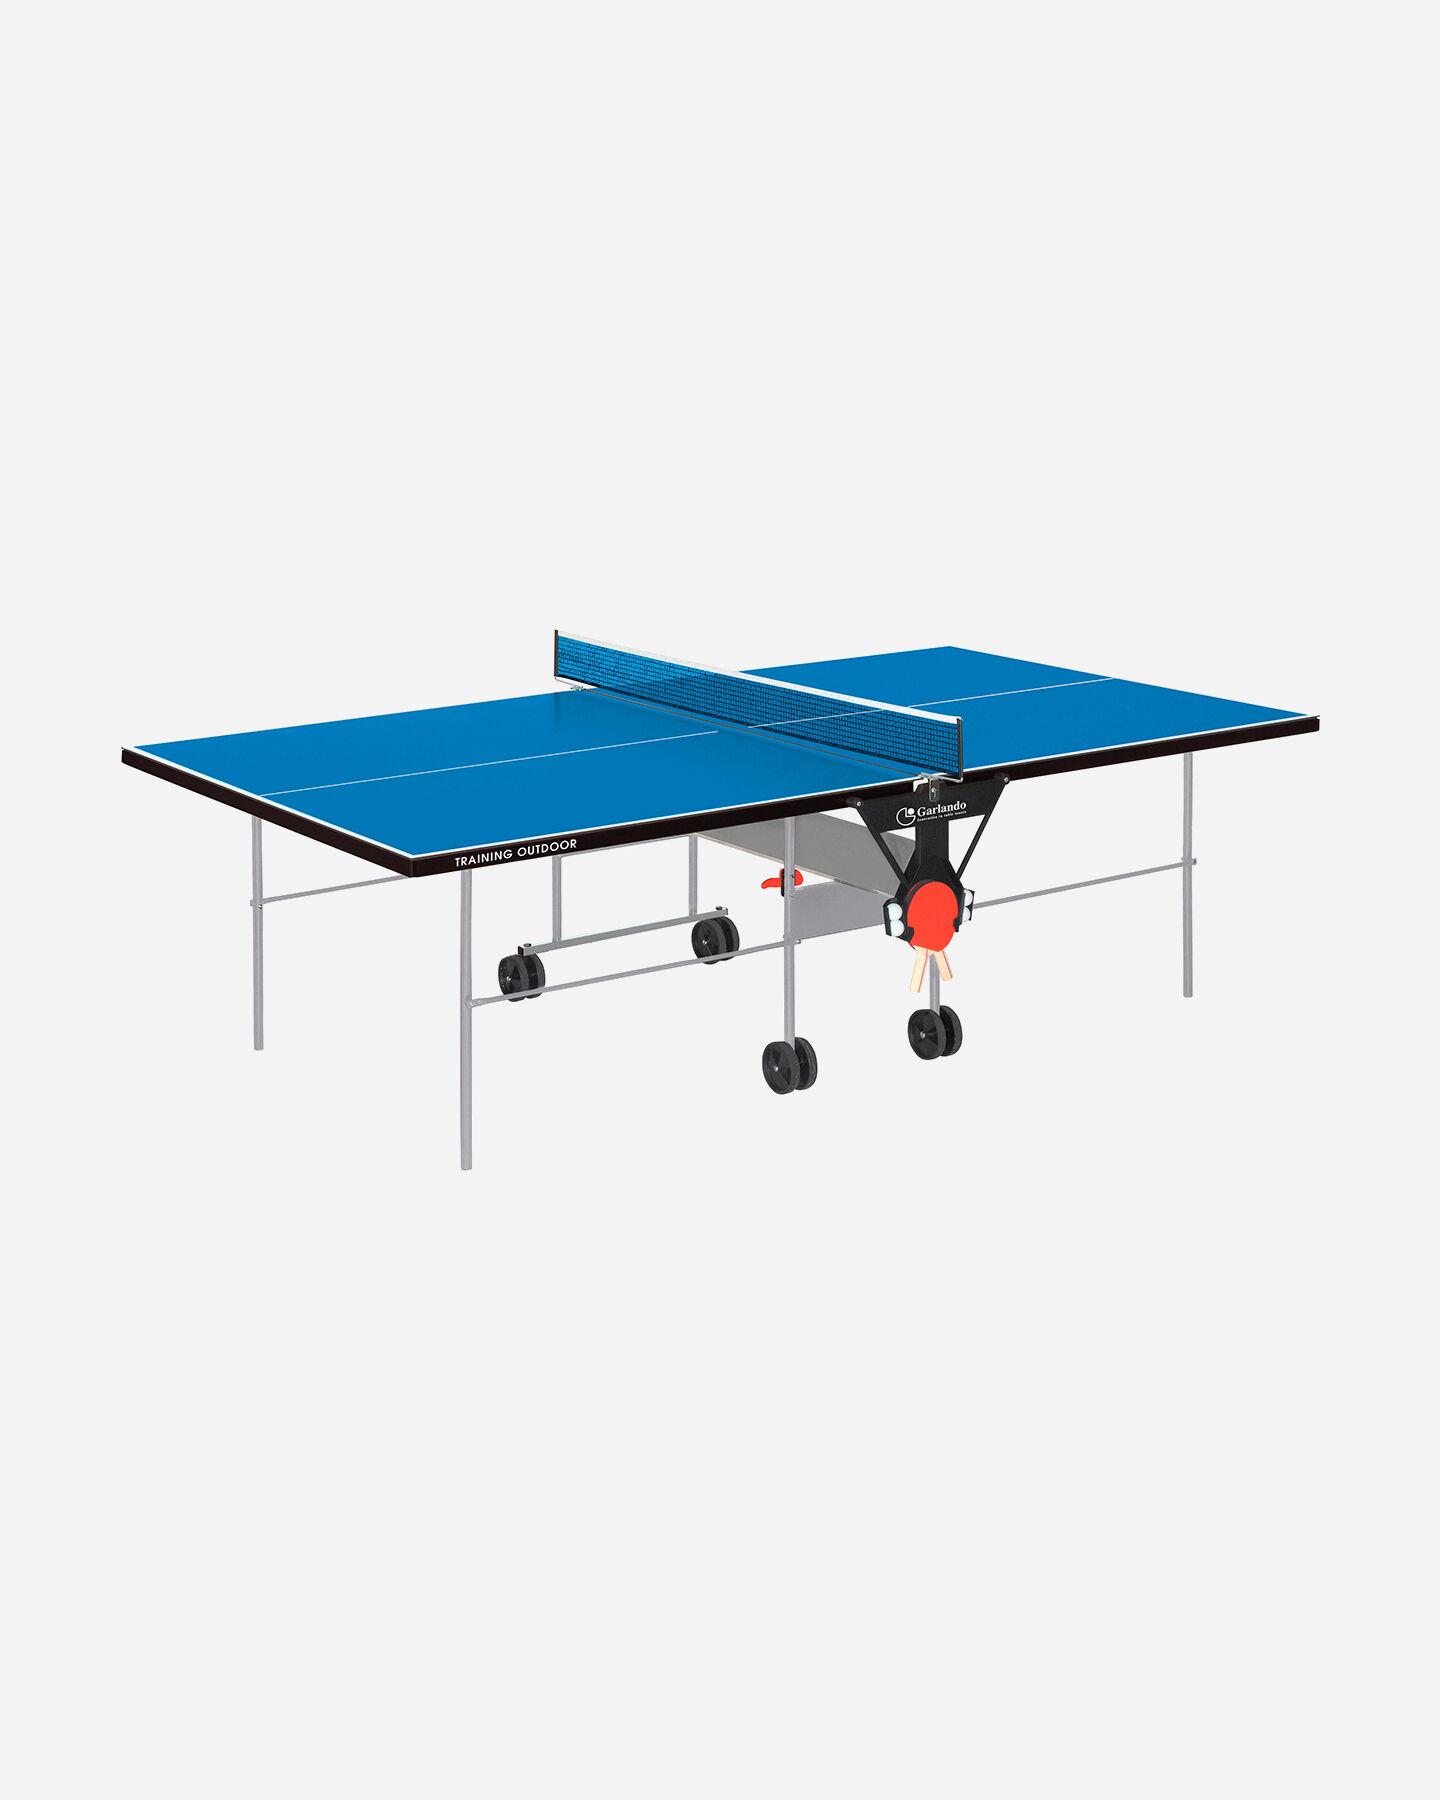 Tavolo ping pong GARLANDO TRAINING OUTDOOR S1222908|N.D.|UNI scatto 0